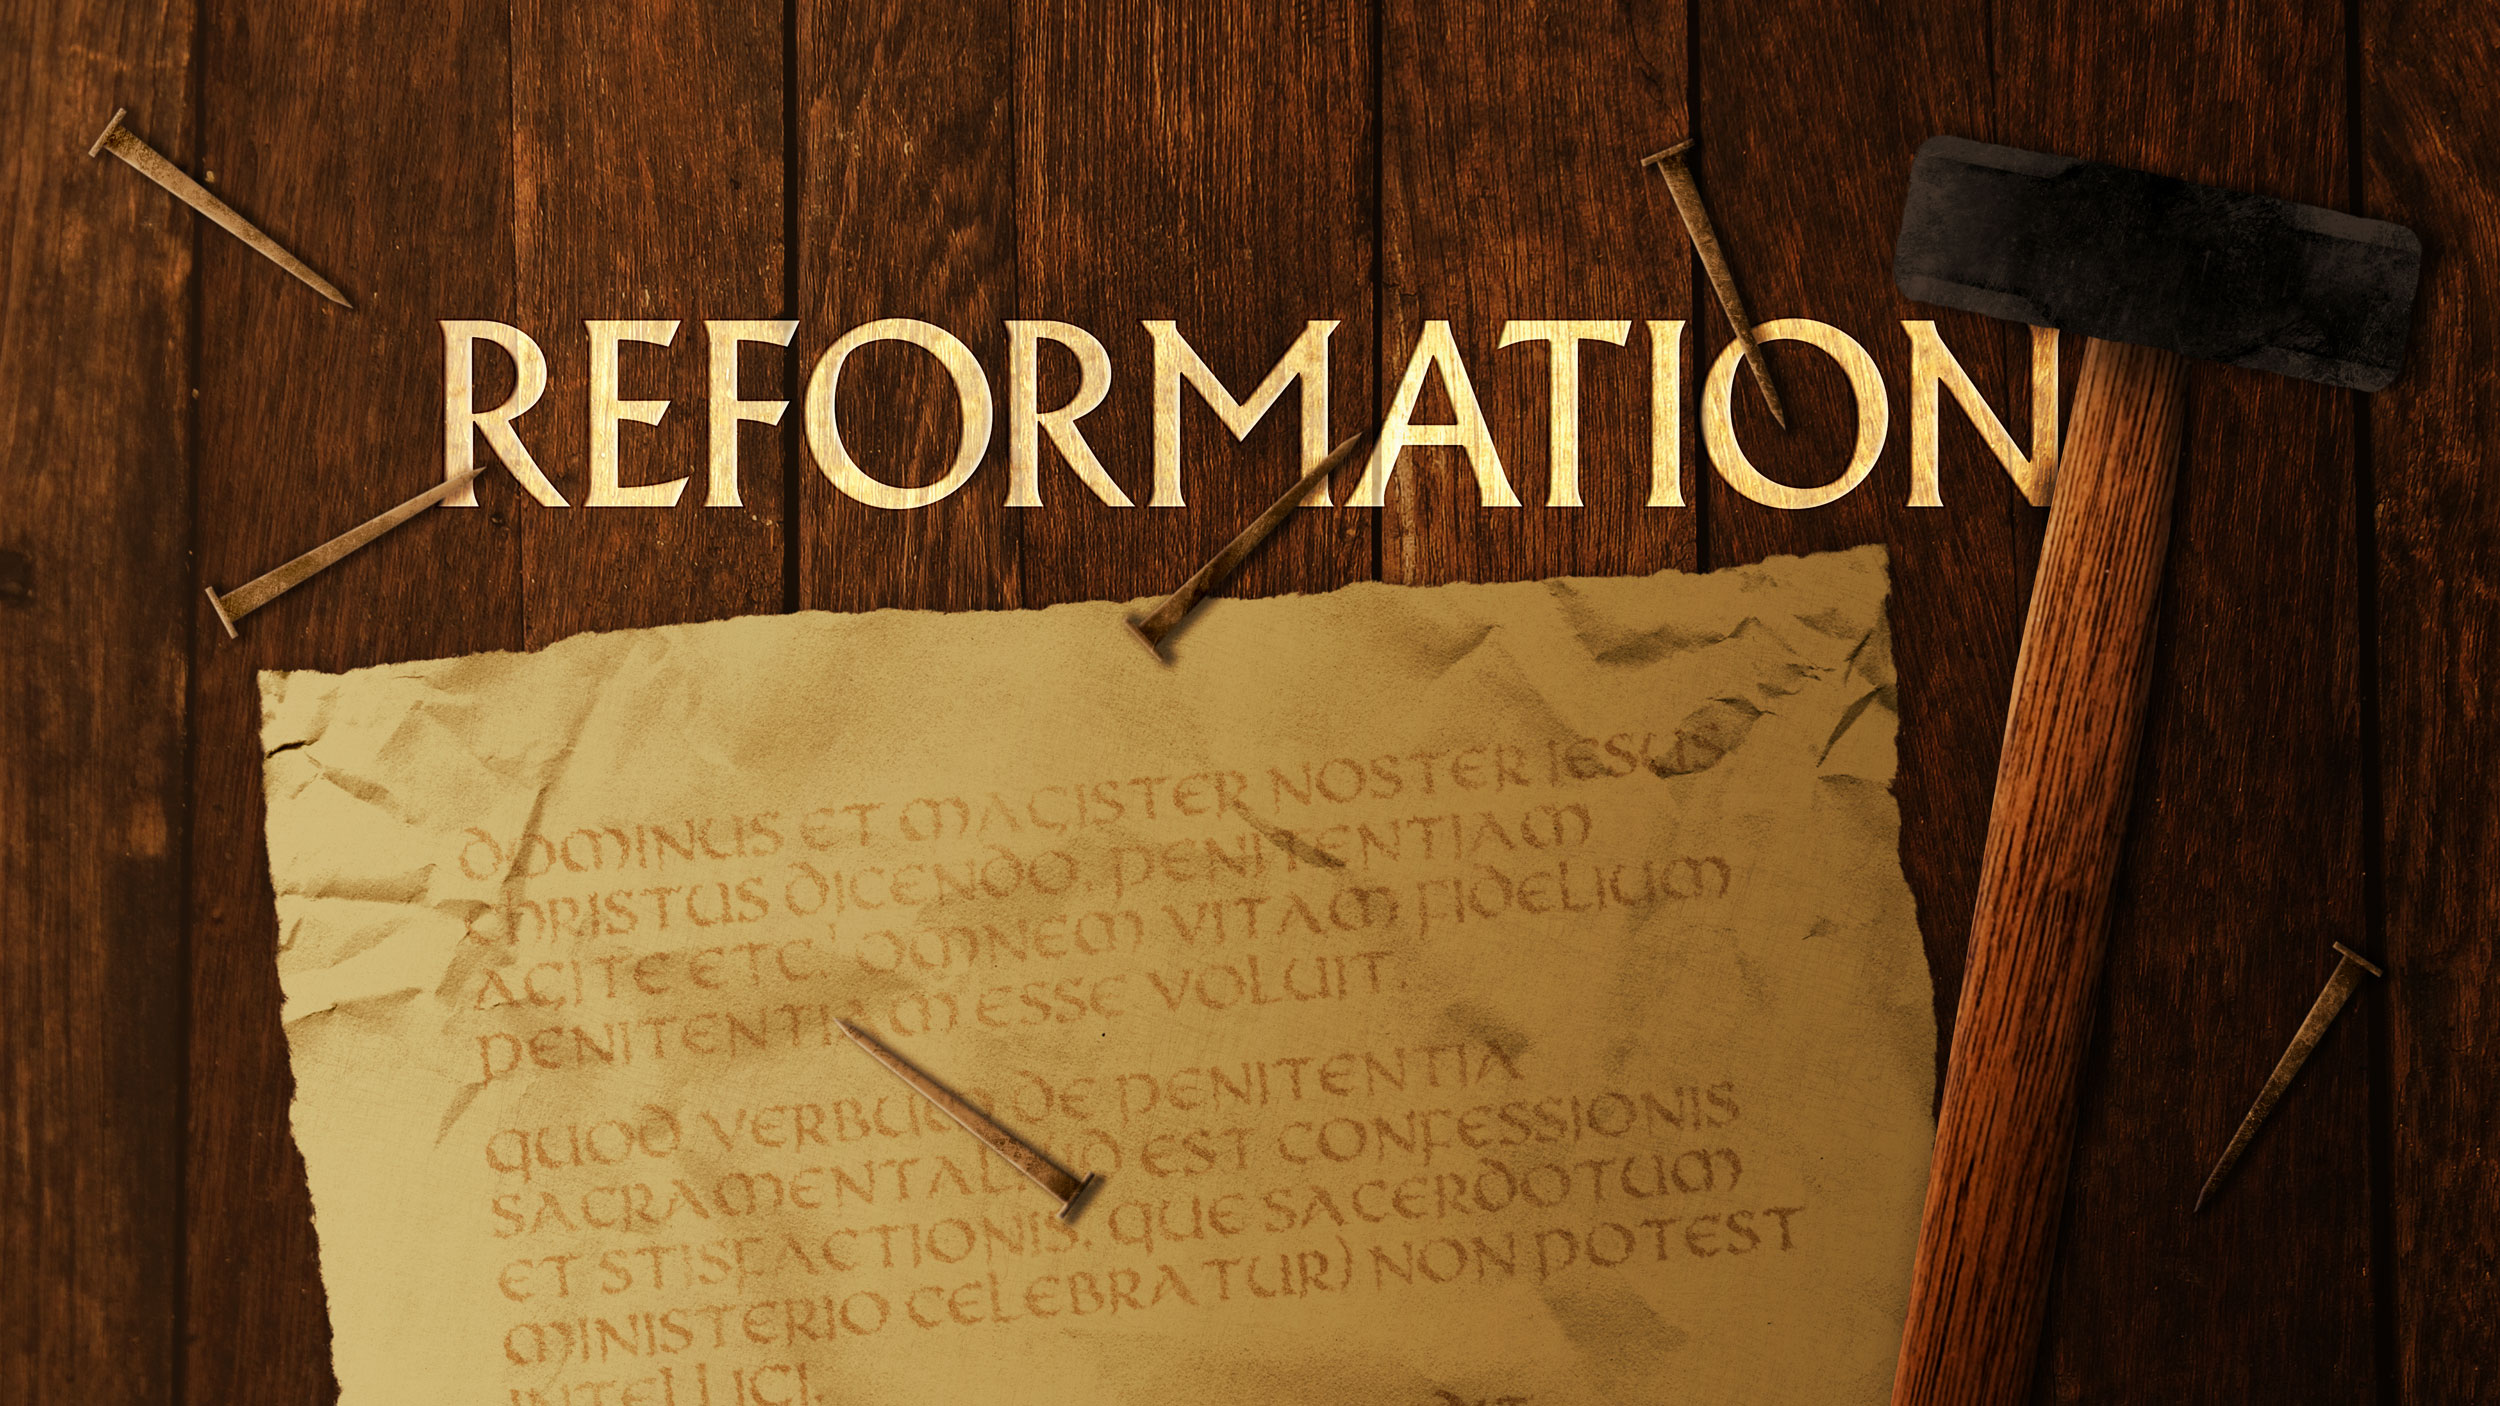 Reformation_Jim-LePage.jpg